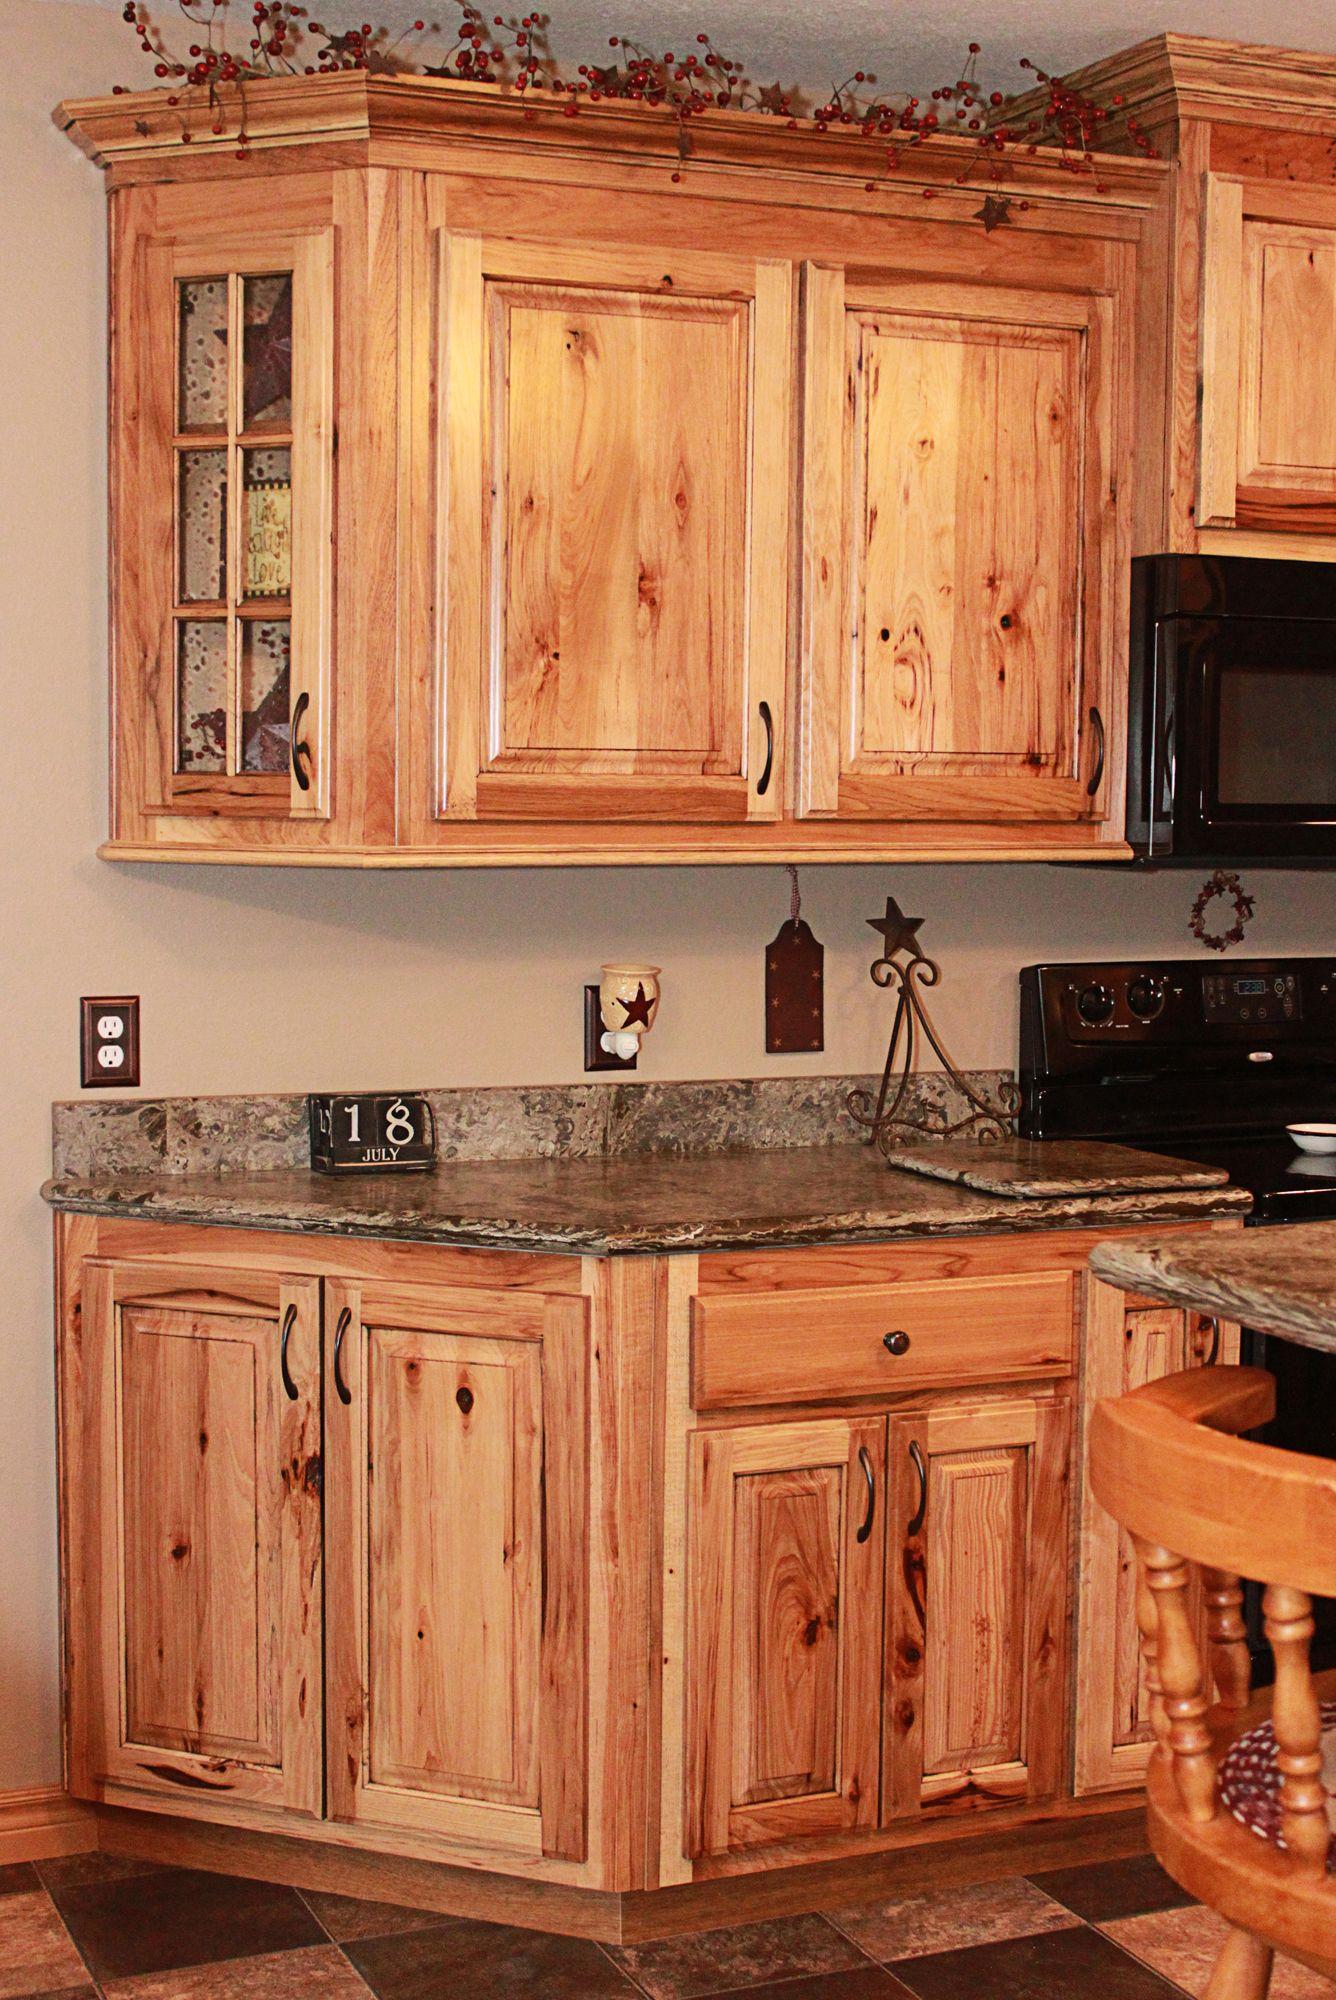 Pin by mandi scheuer on kitchen ideas pinterest kitchens house